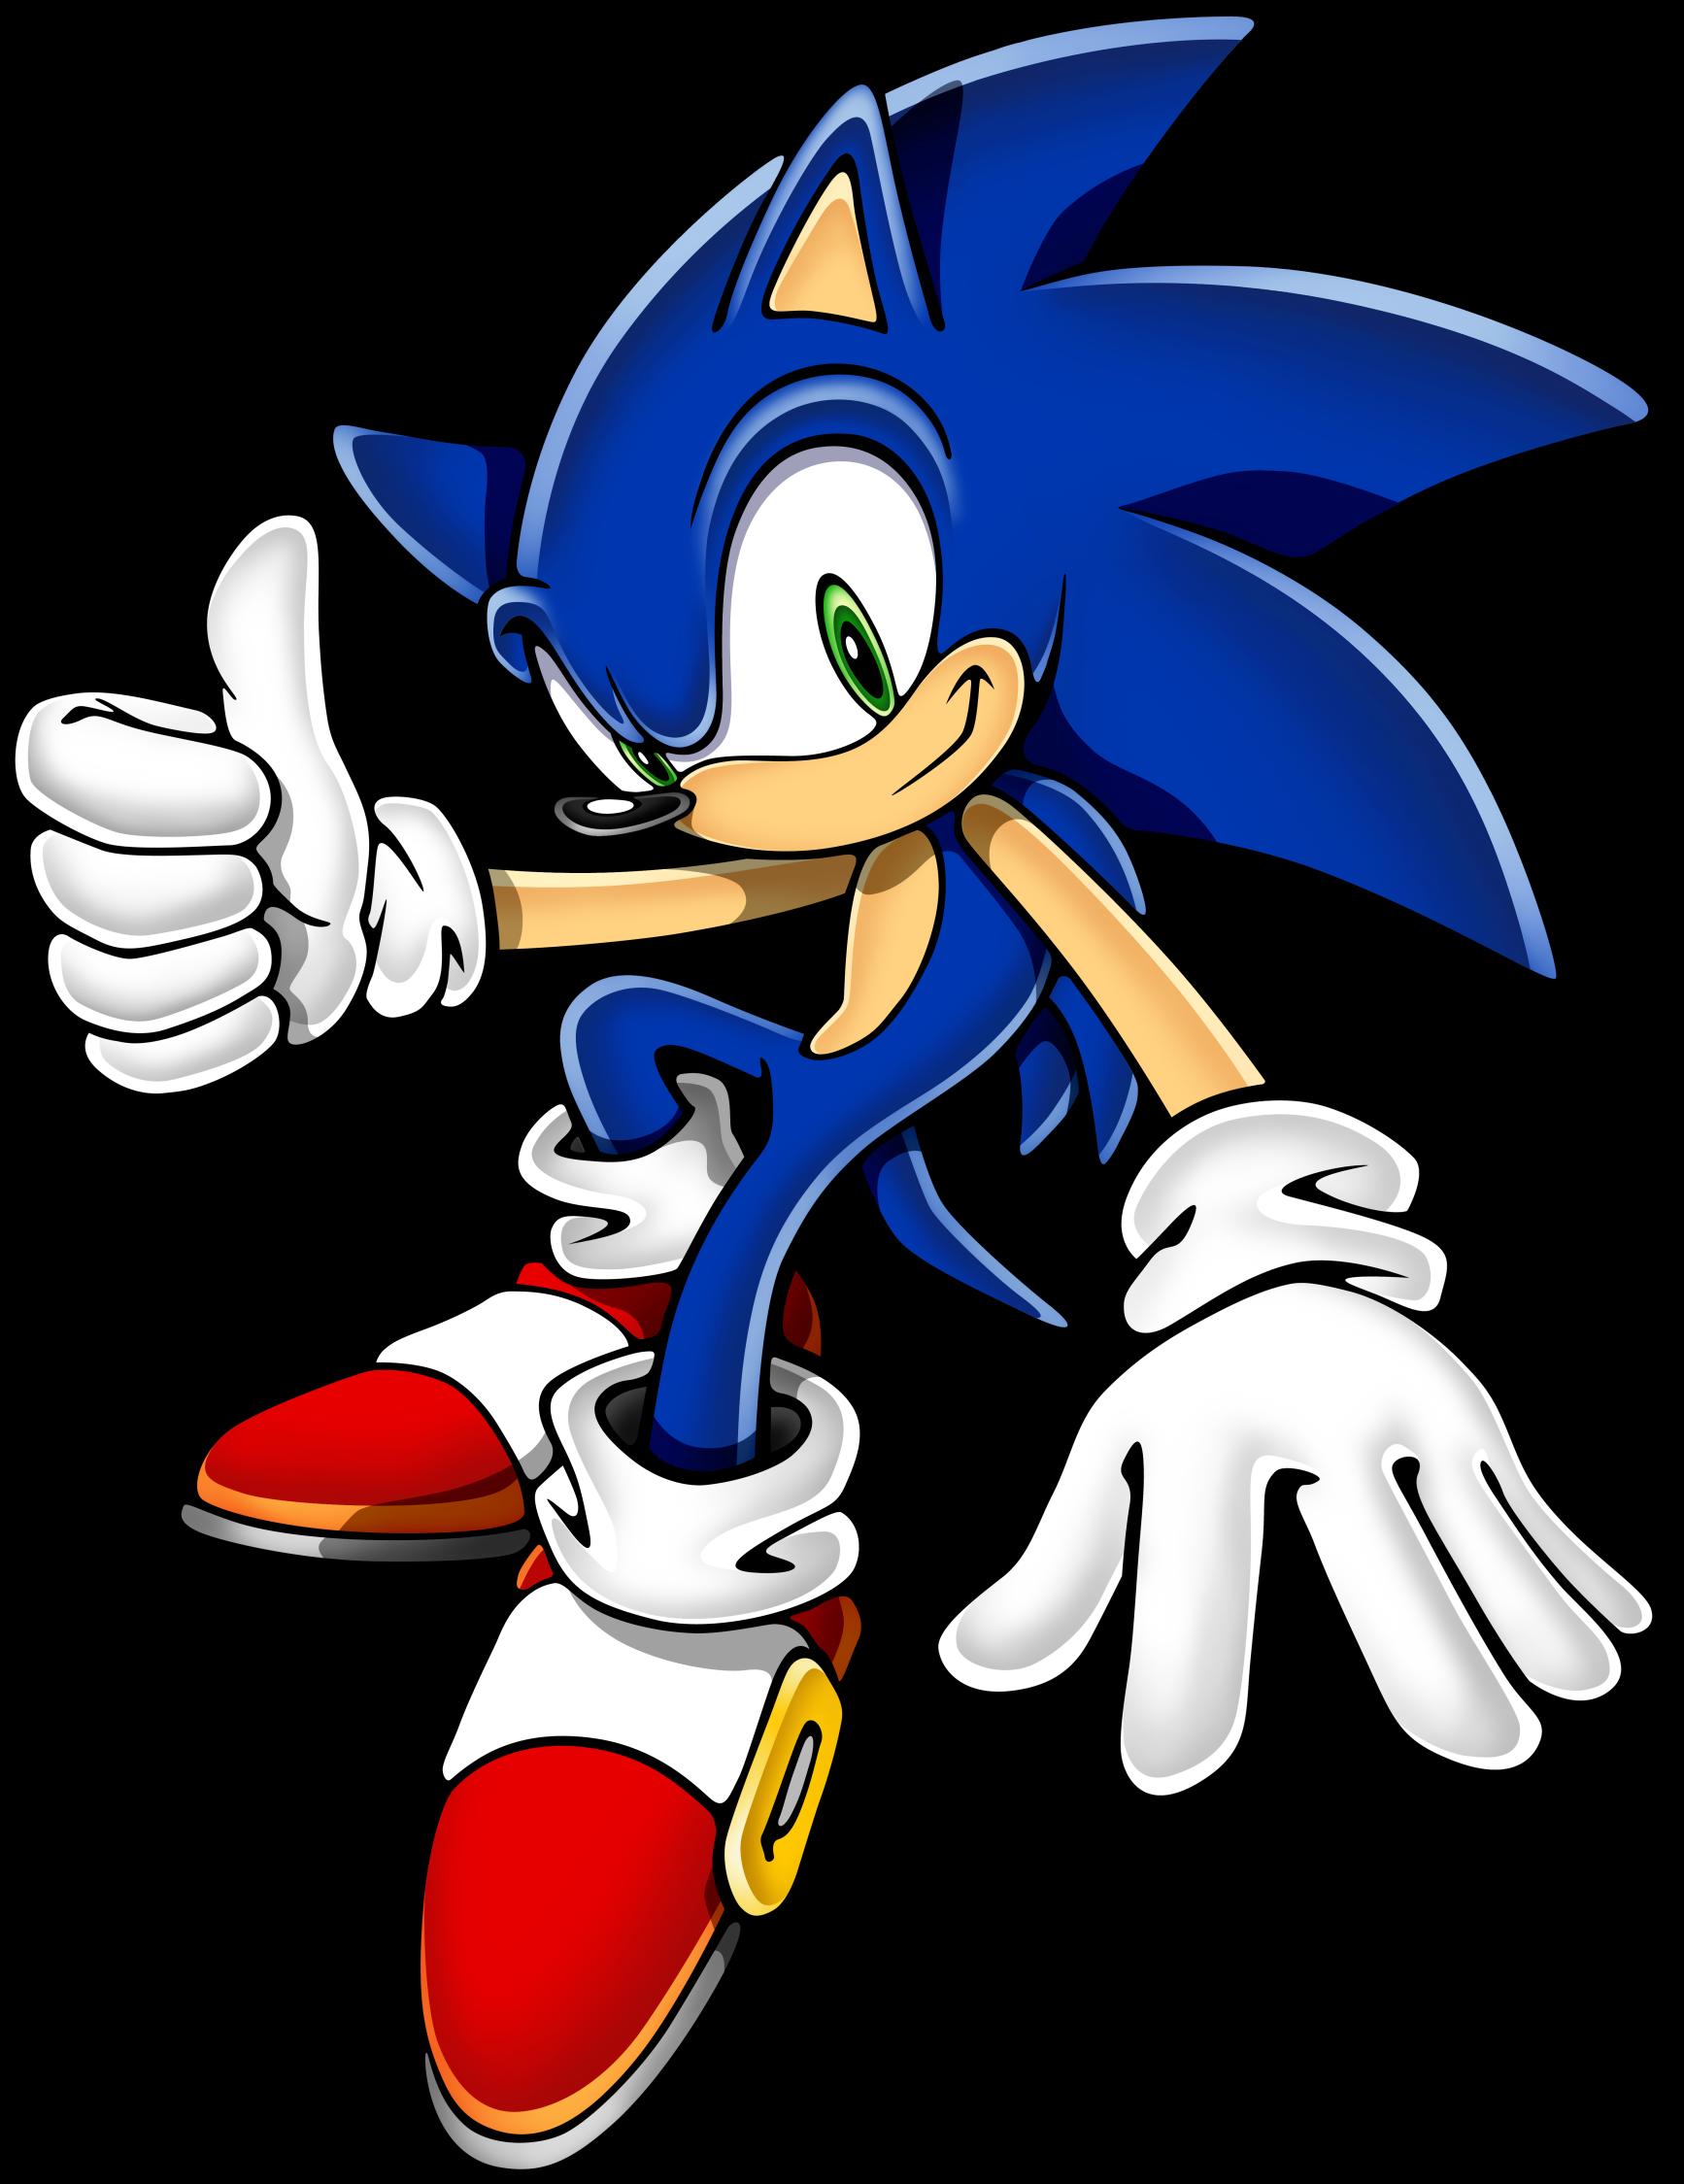 Sonic The Hedgehog Fictional Characters Wiki Fandom